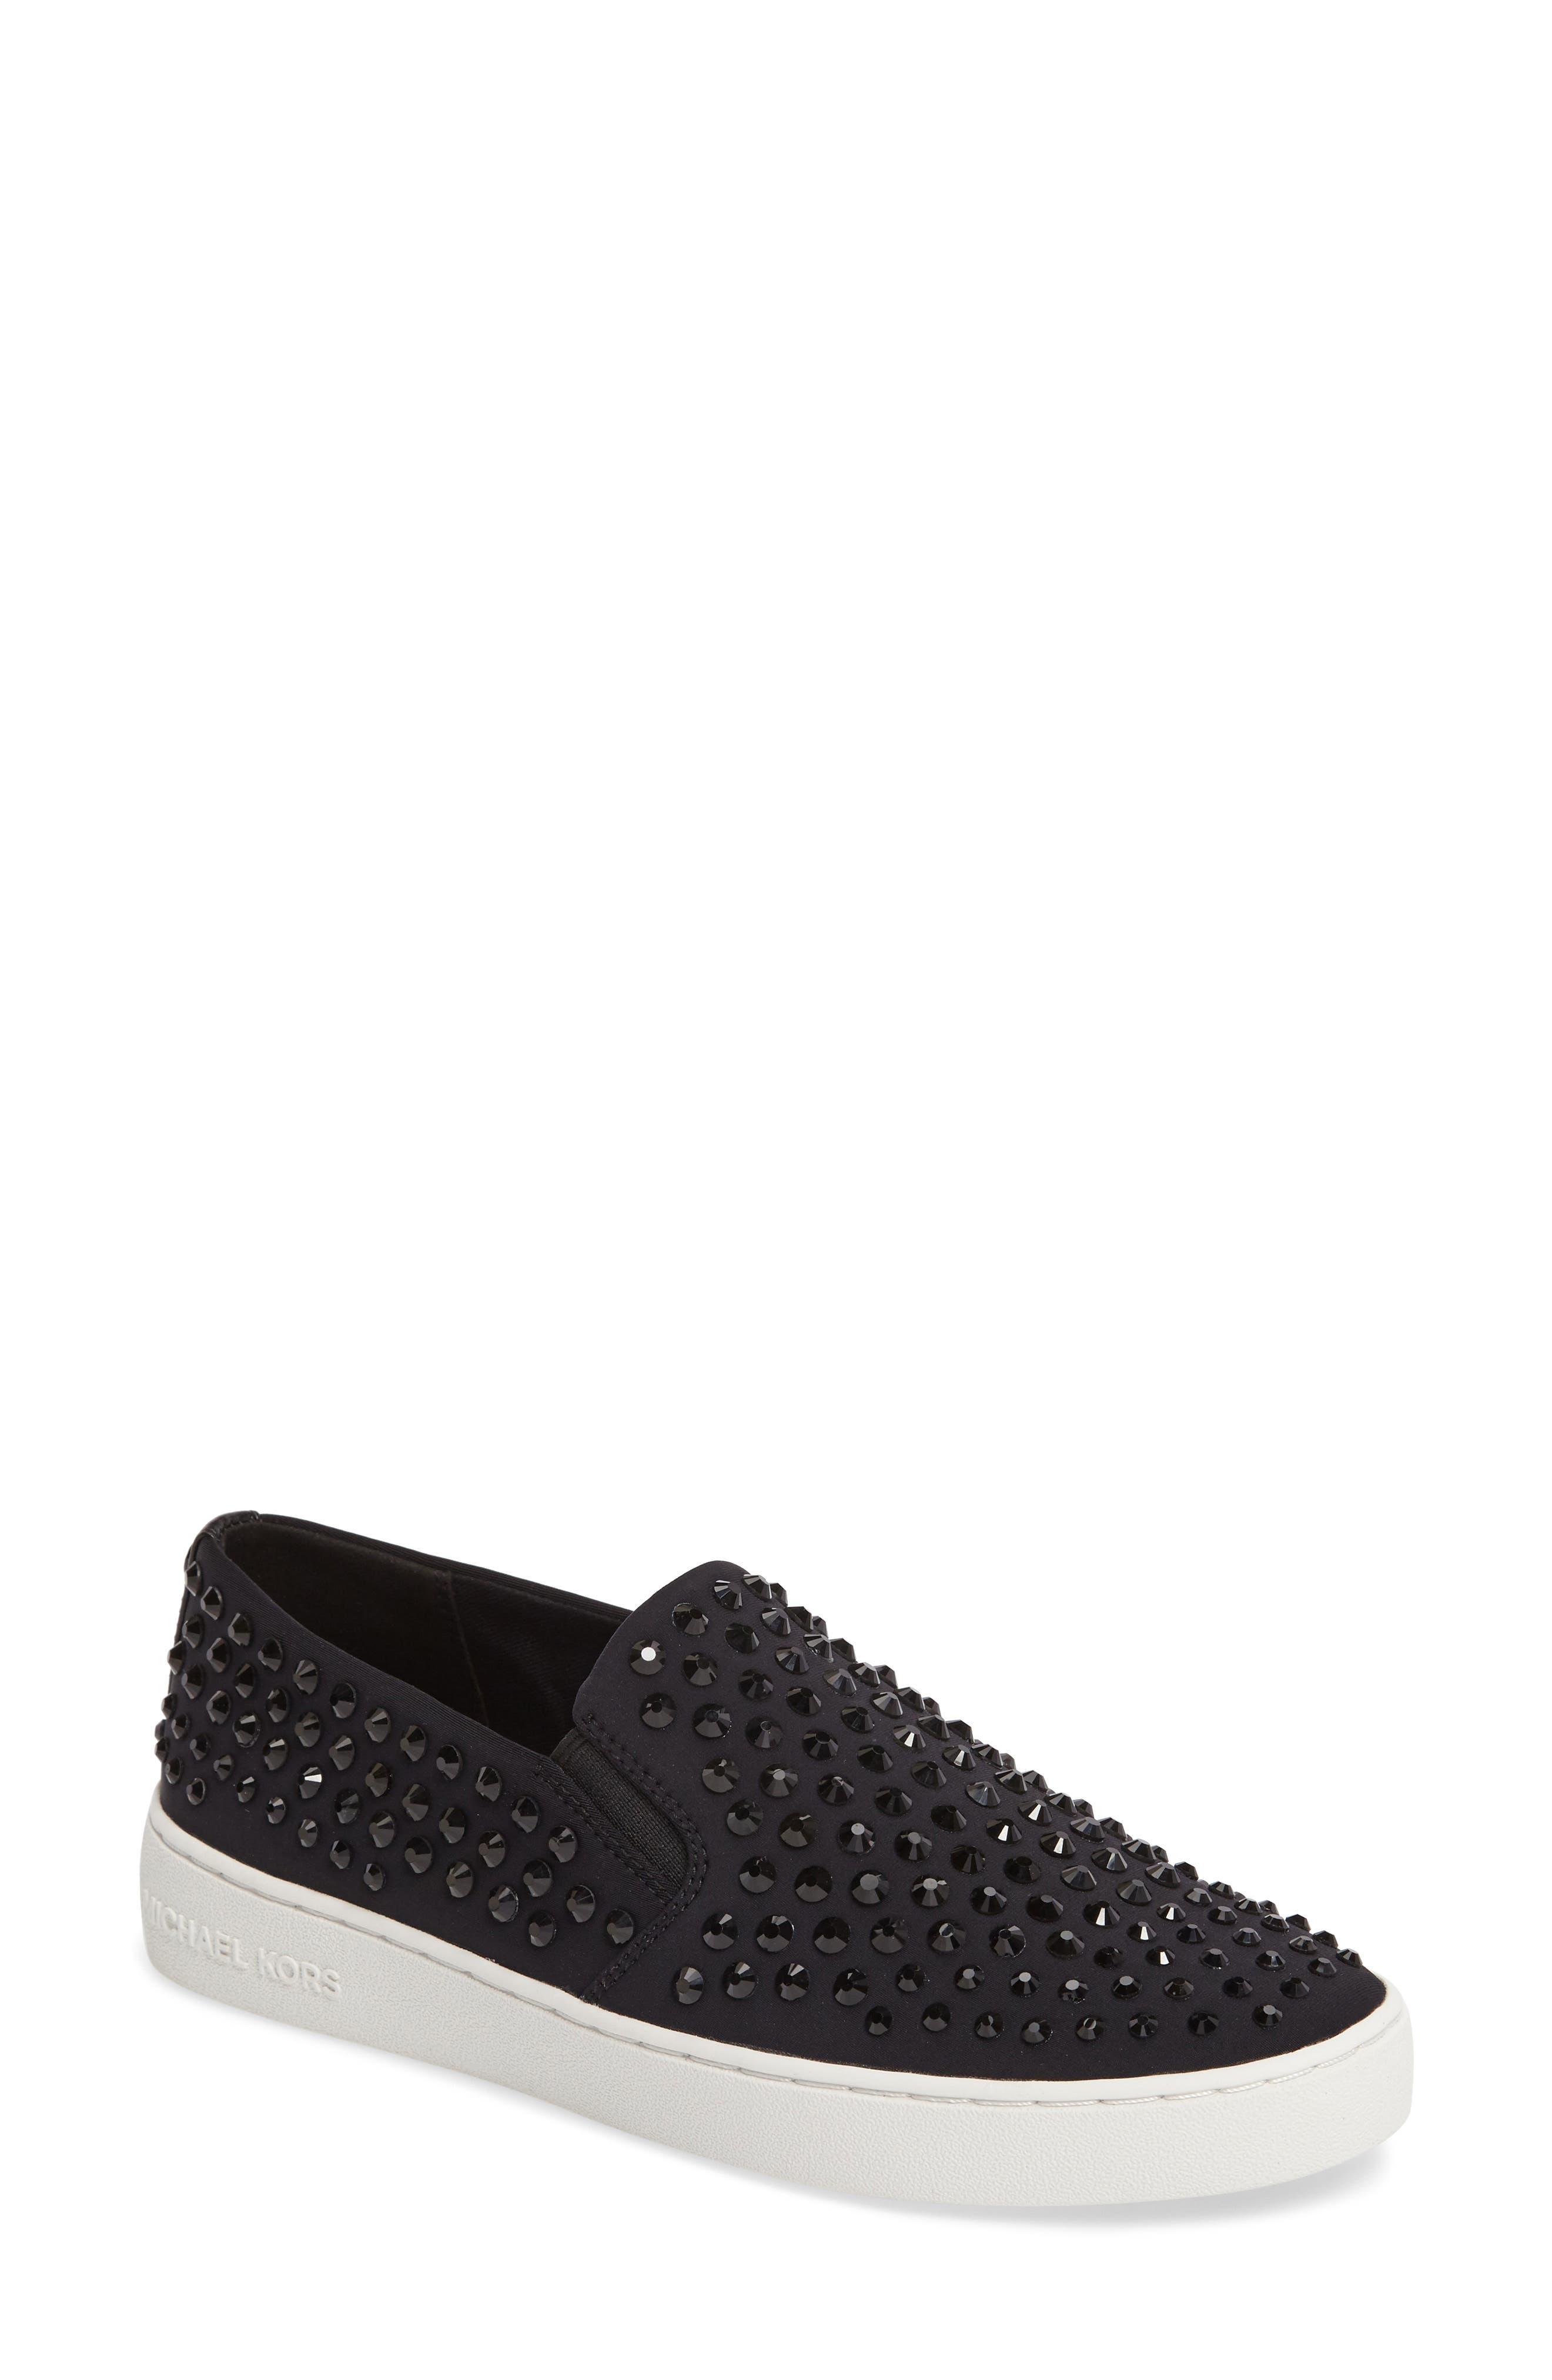 Alternate Image 1 Selected - MICHAEL Michael Kors Keaton Slip-On Sneaker (Women)